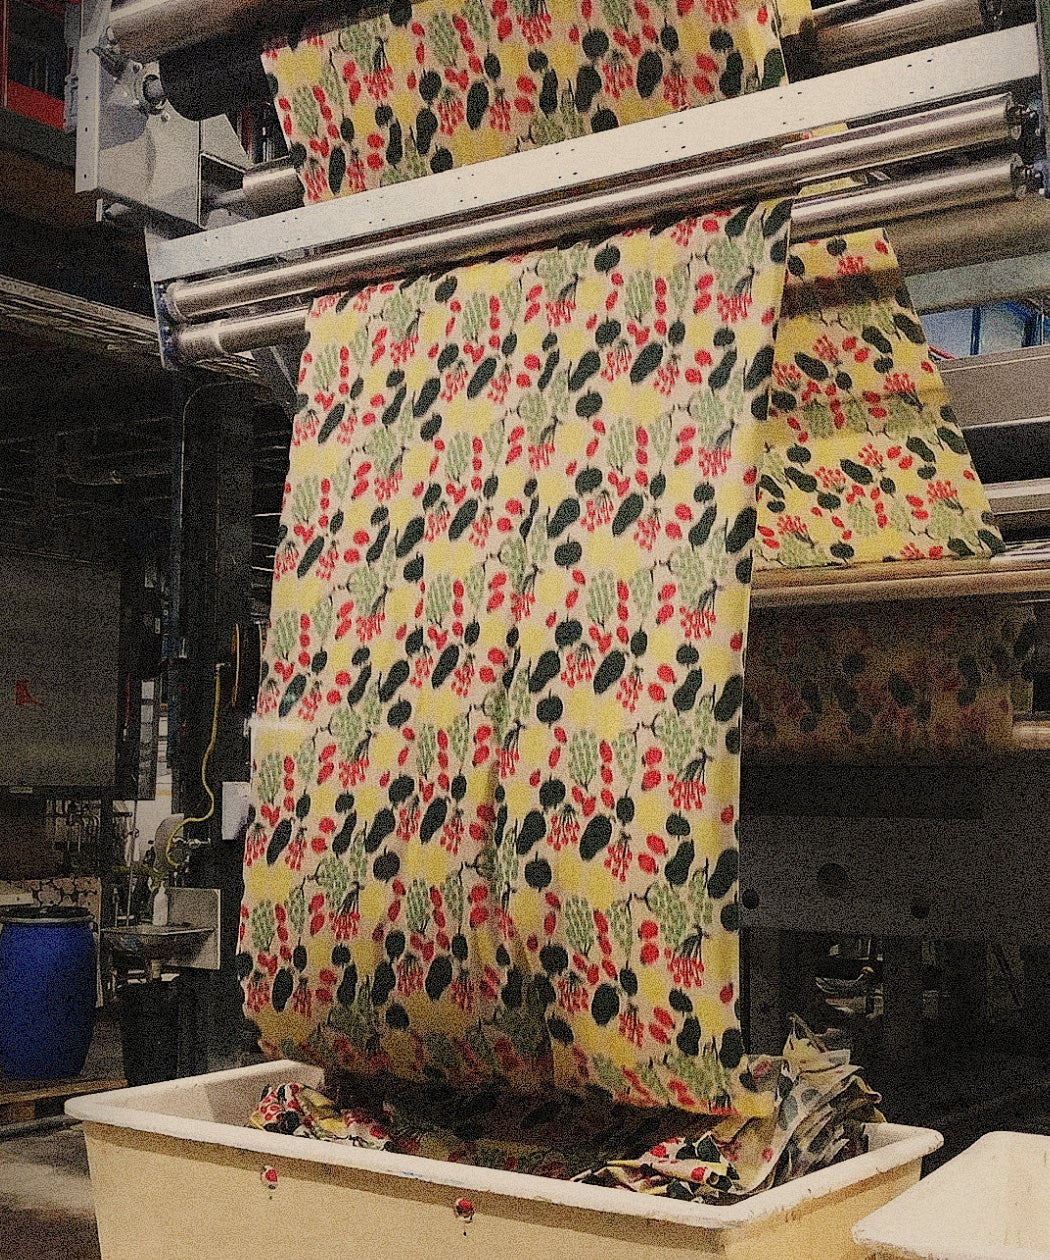 Marimekko Pieni Tori fabric